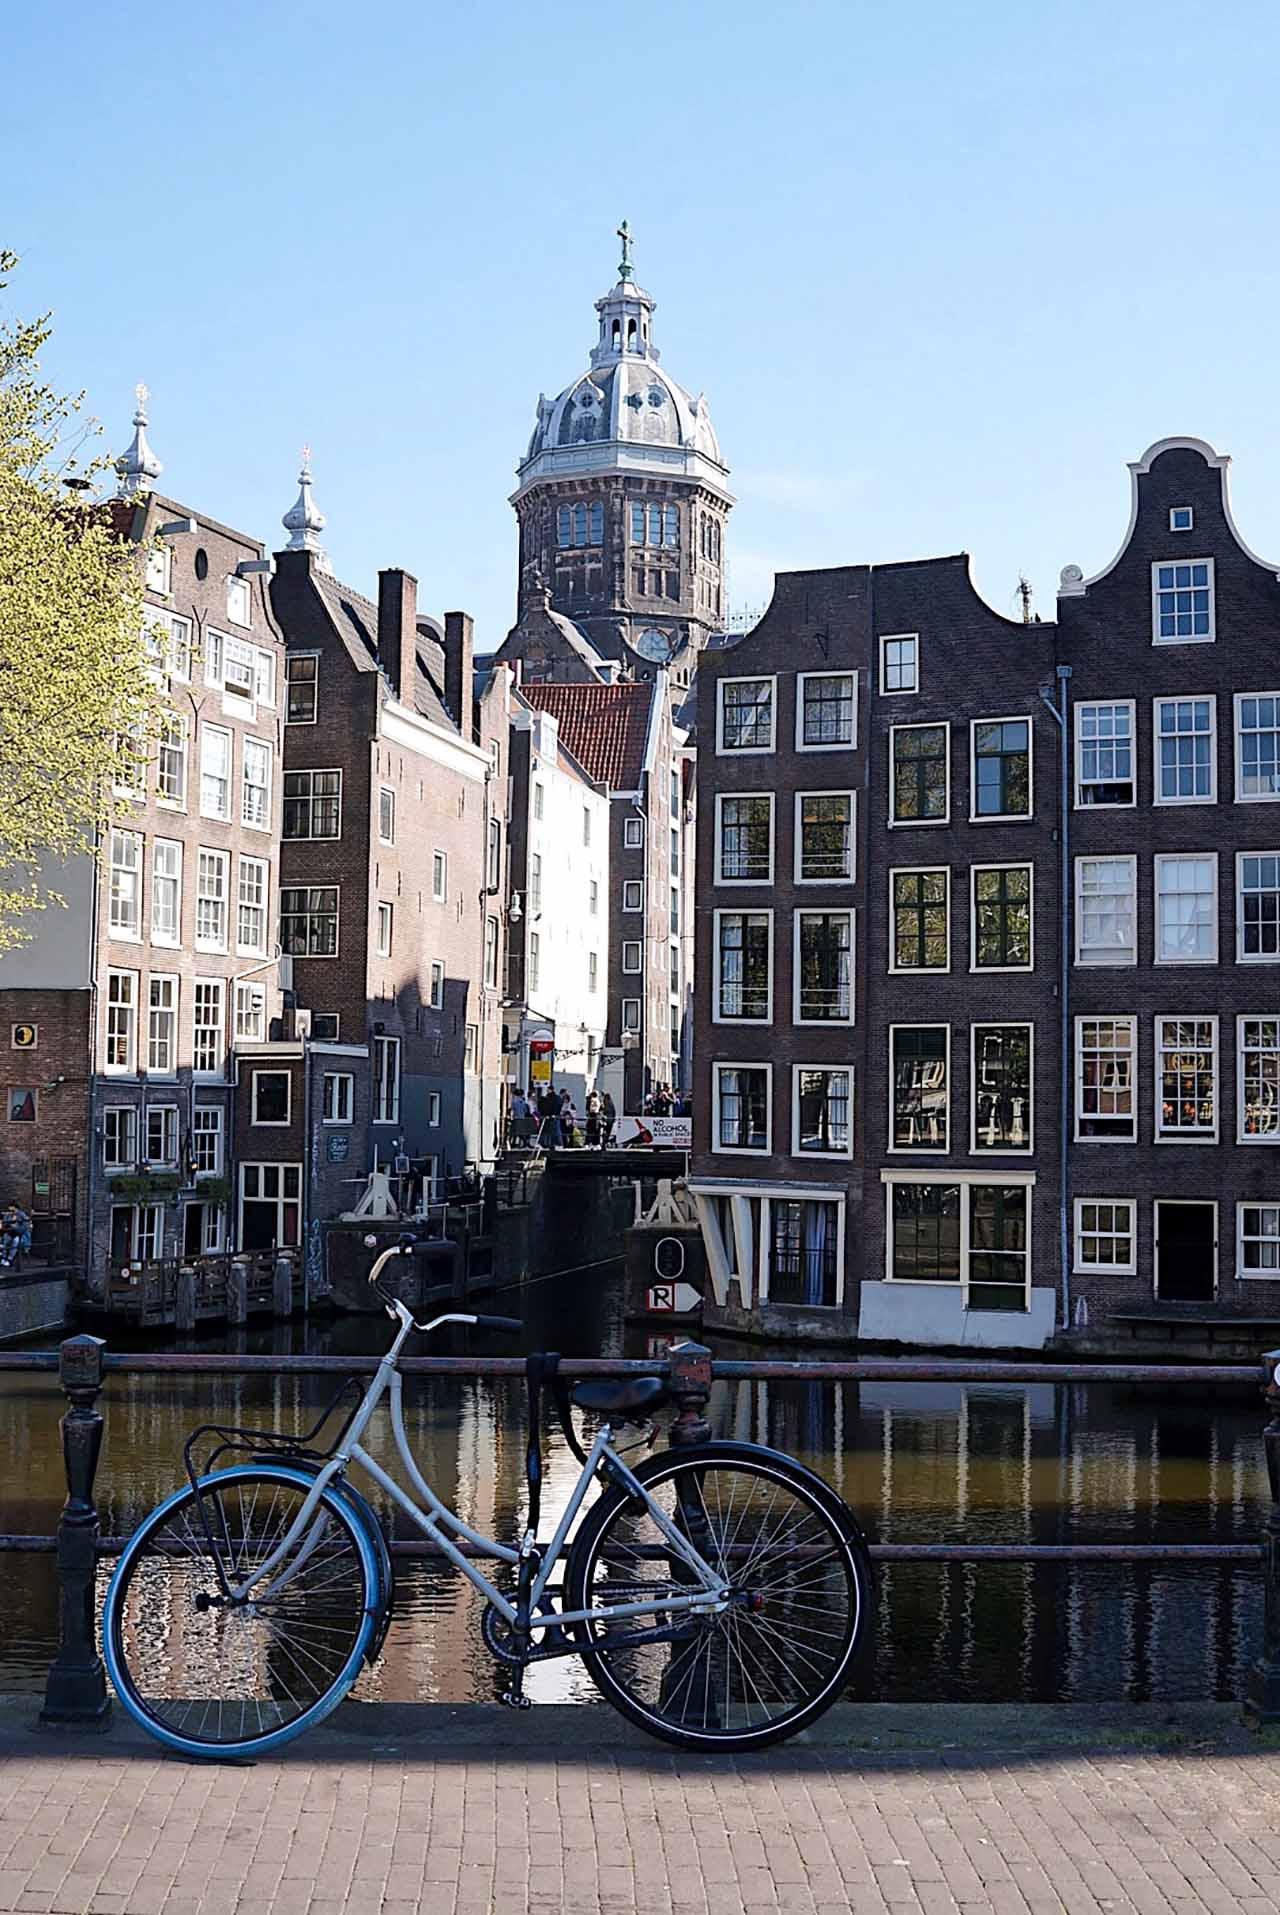 Bike and canal Amsterdam